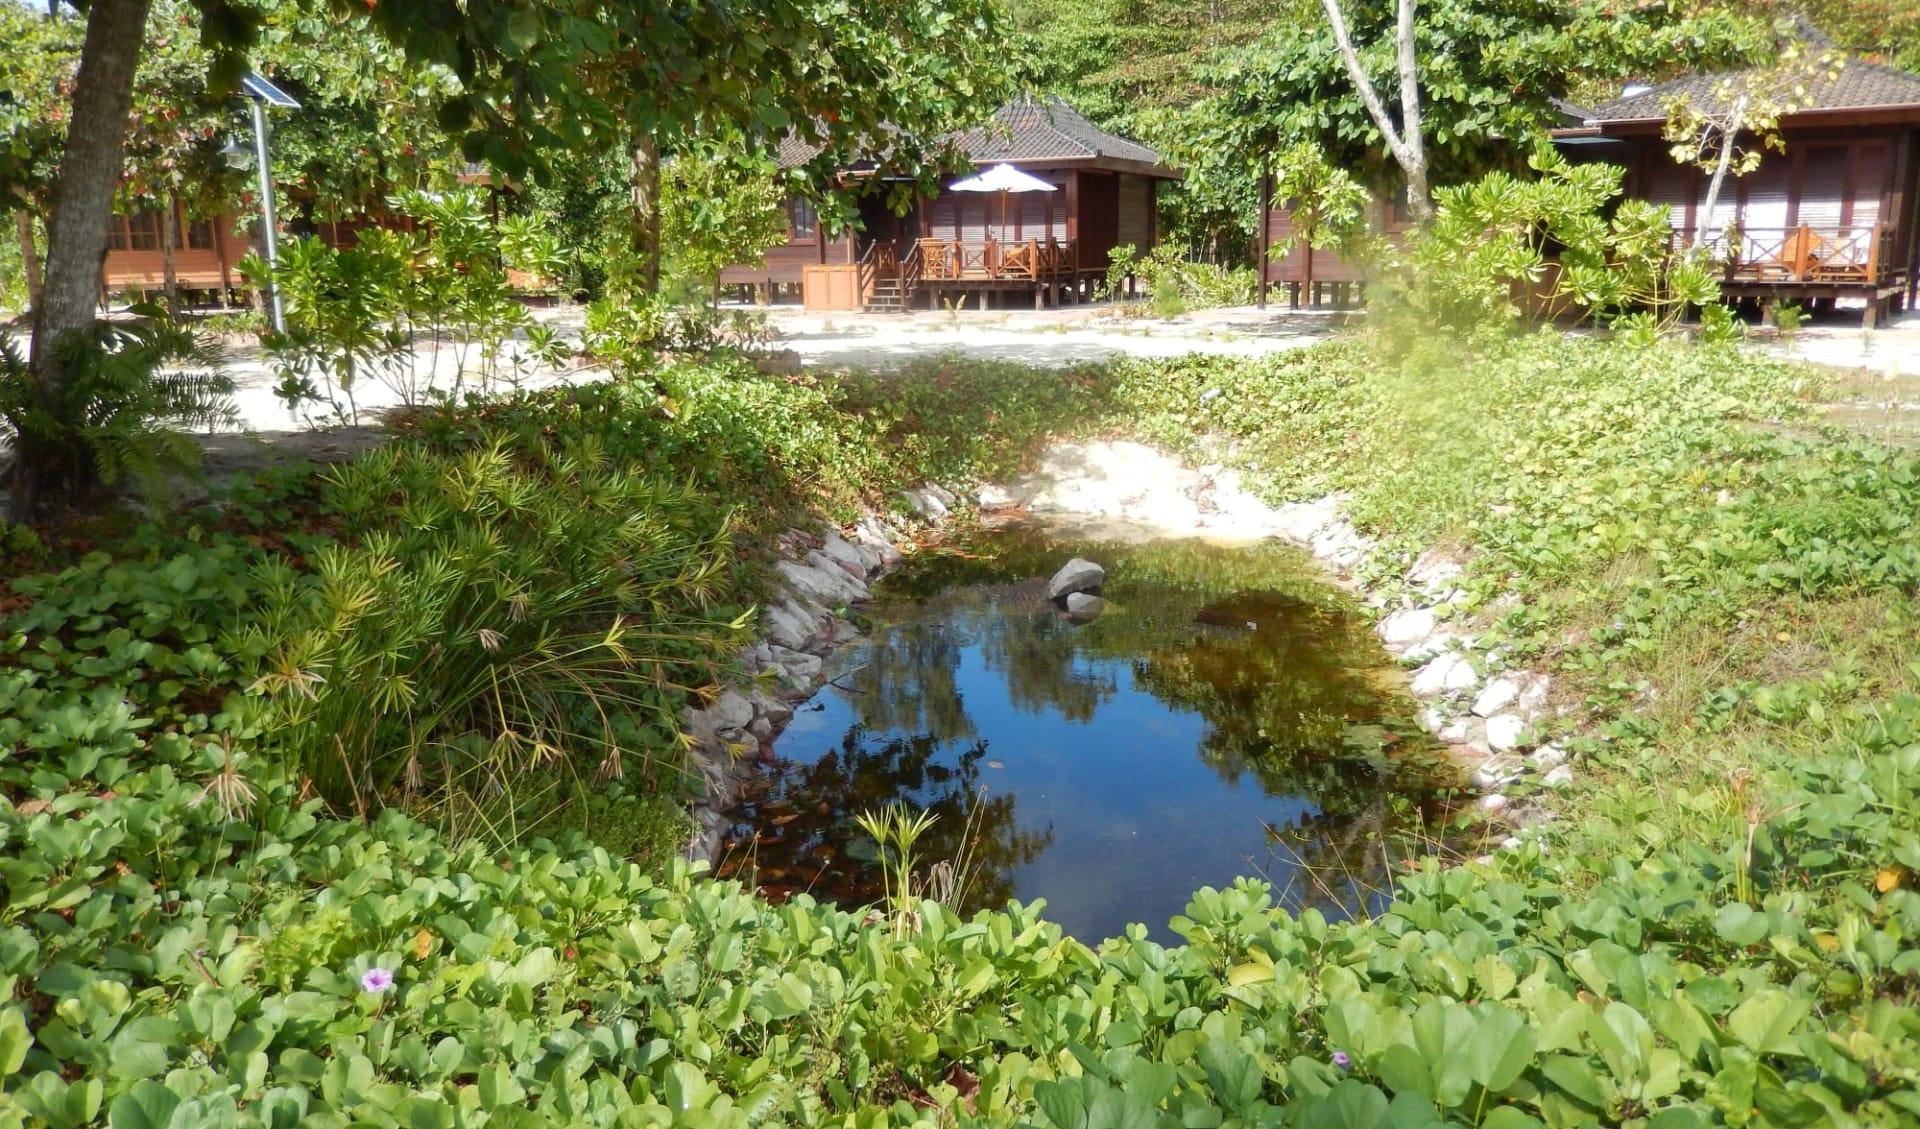 Heliconia Grove in Praslin: Pond